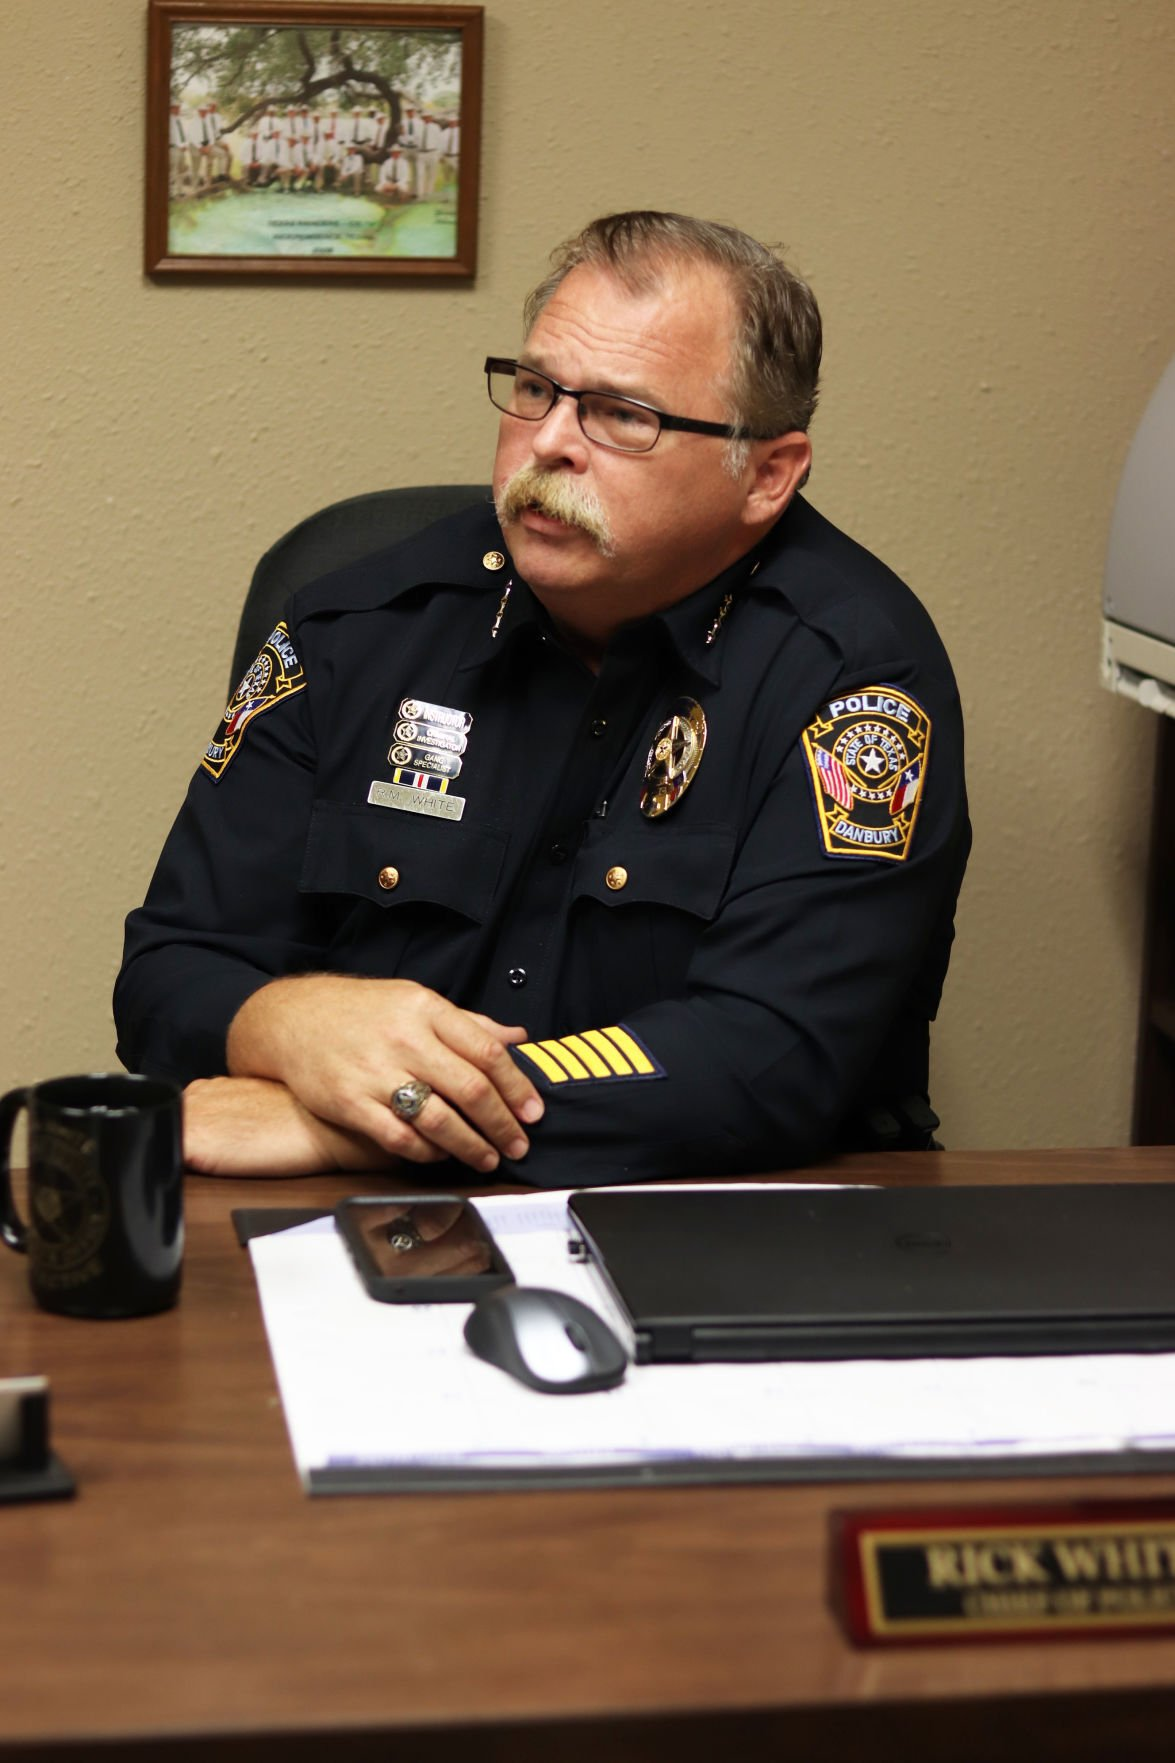 Danbury police chief